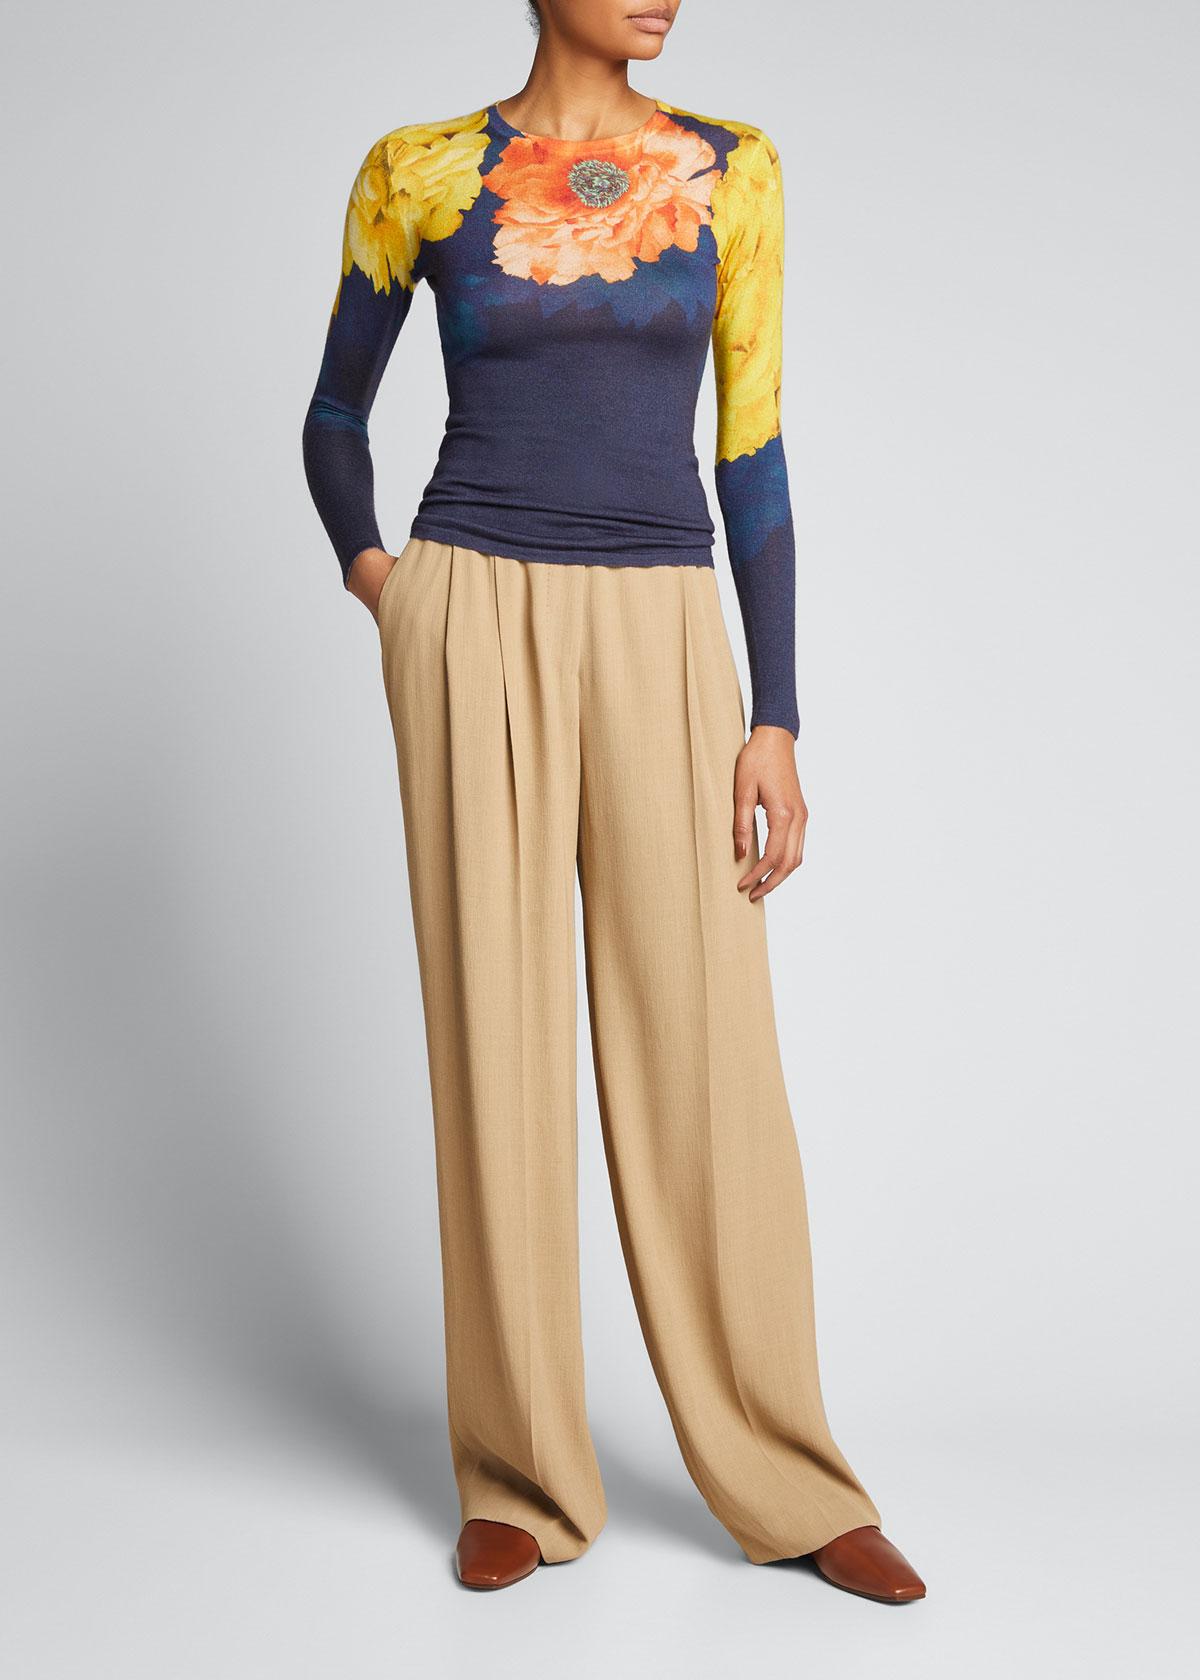 Jason Wu Collection Silks FLORAL-PRINT FINE-GAUGE SWEATER